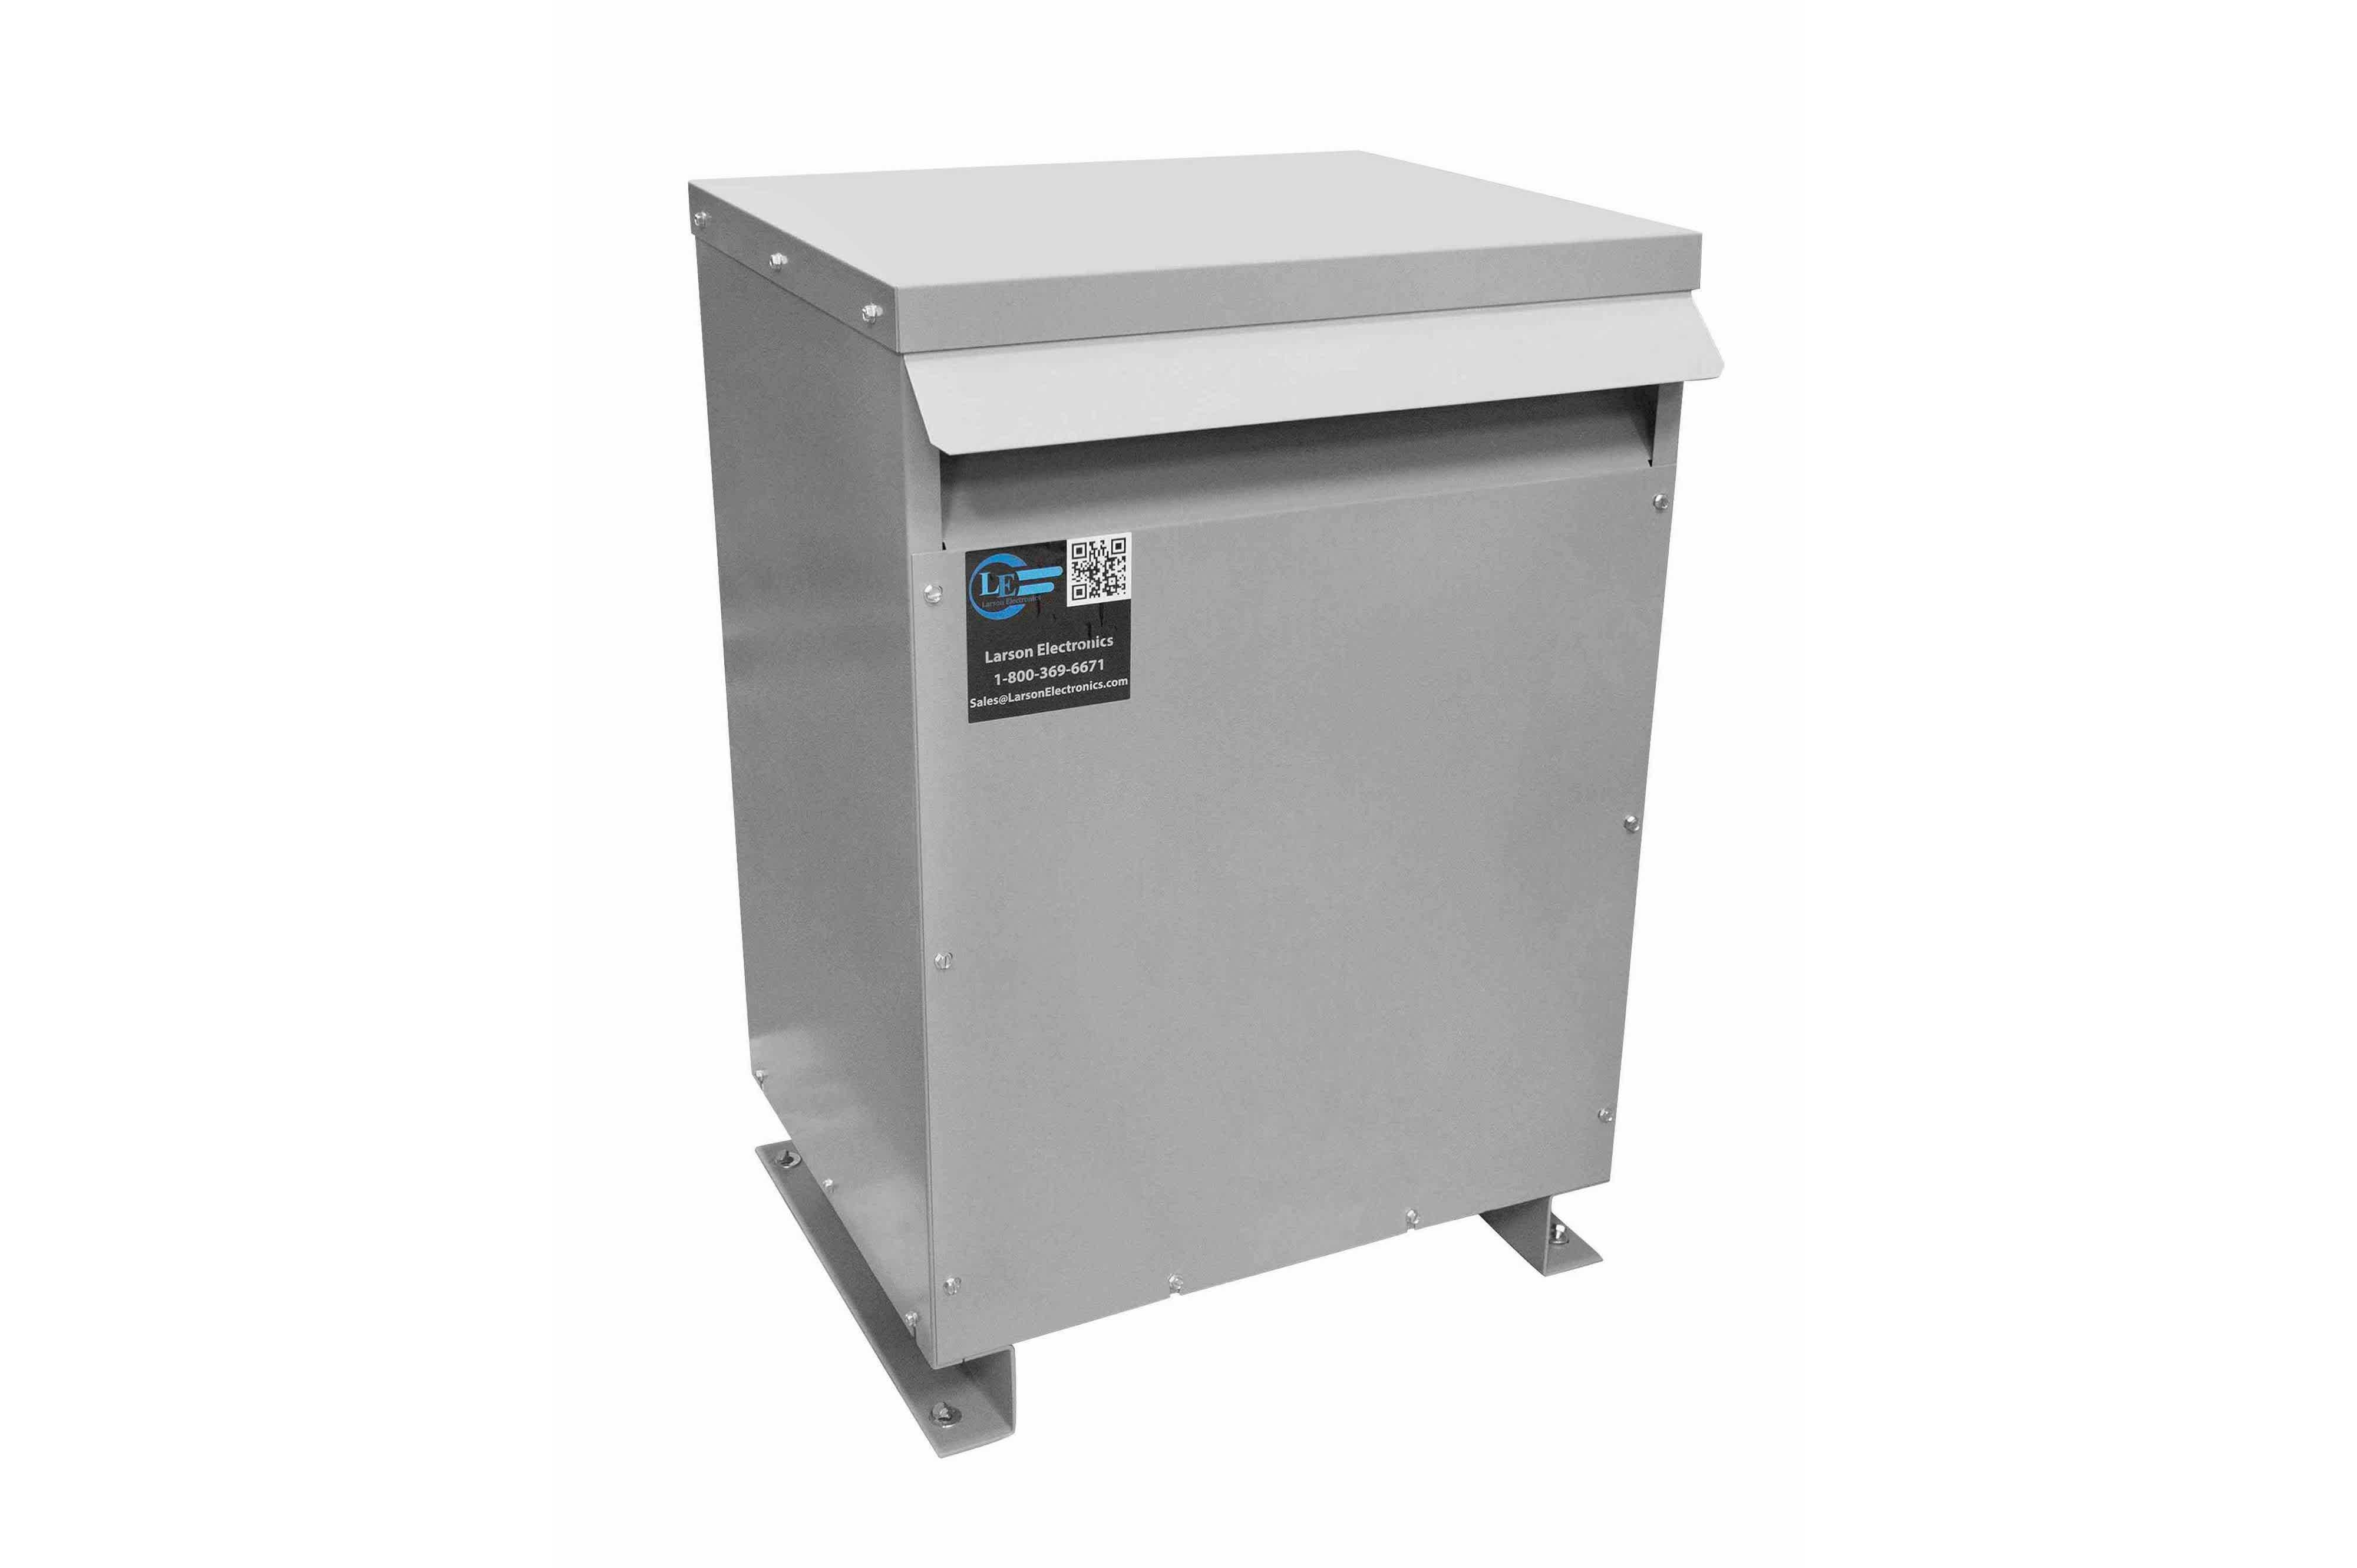 175 kVA 3PH Isolation Transformer, 240V Wye Primary, 208Y/120 Wye-N Secondary, N3R, Ventilated, 60 Hz